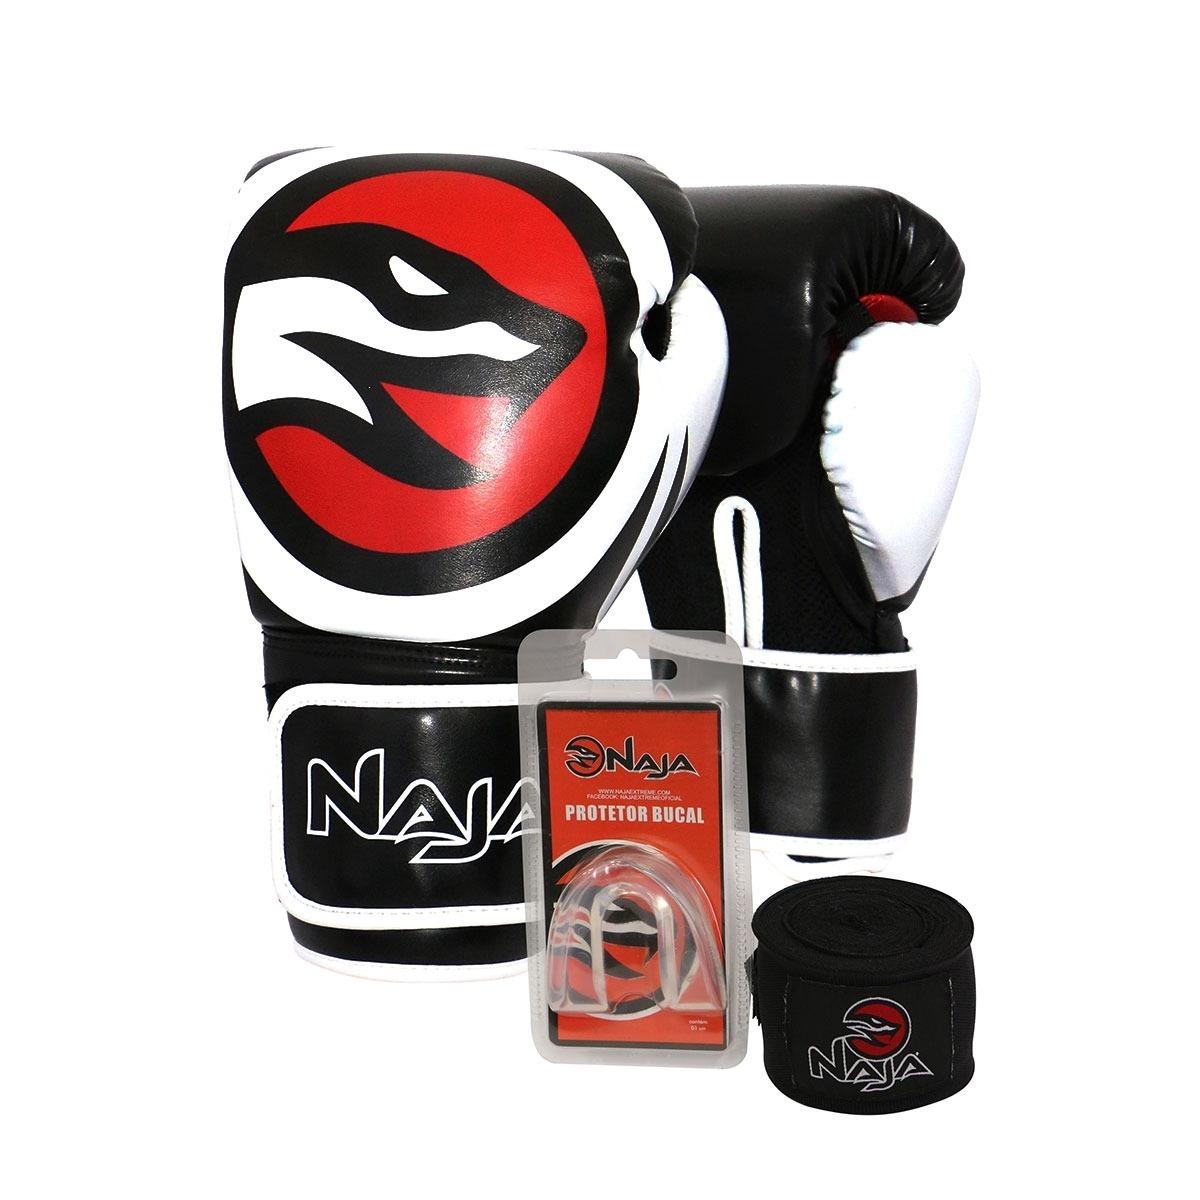 39e6a4a07 Kit Luva Muay Thai Boxe Naja - Band+prot.bucal + Luva Preto - R  120 ...